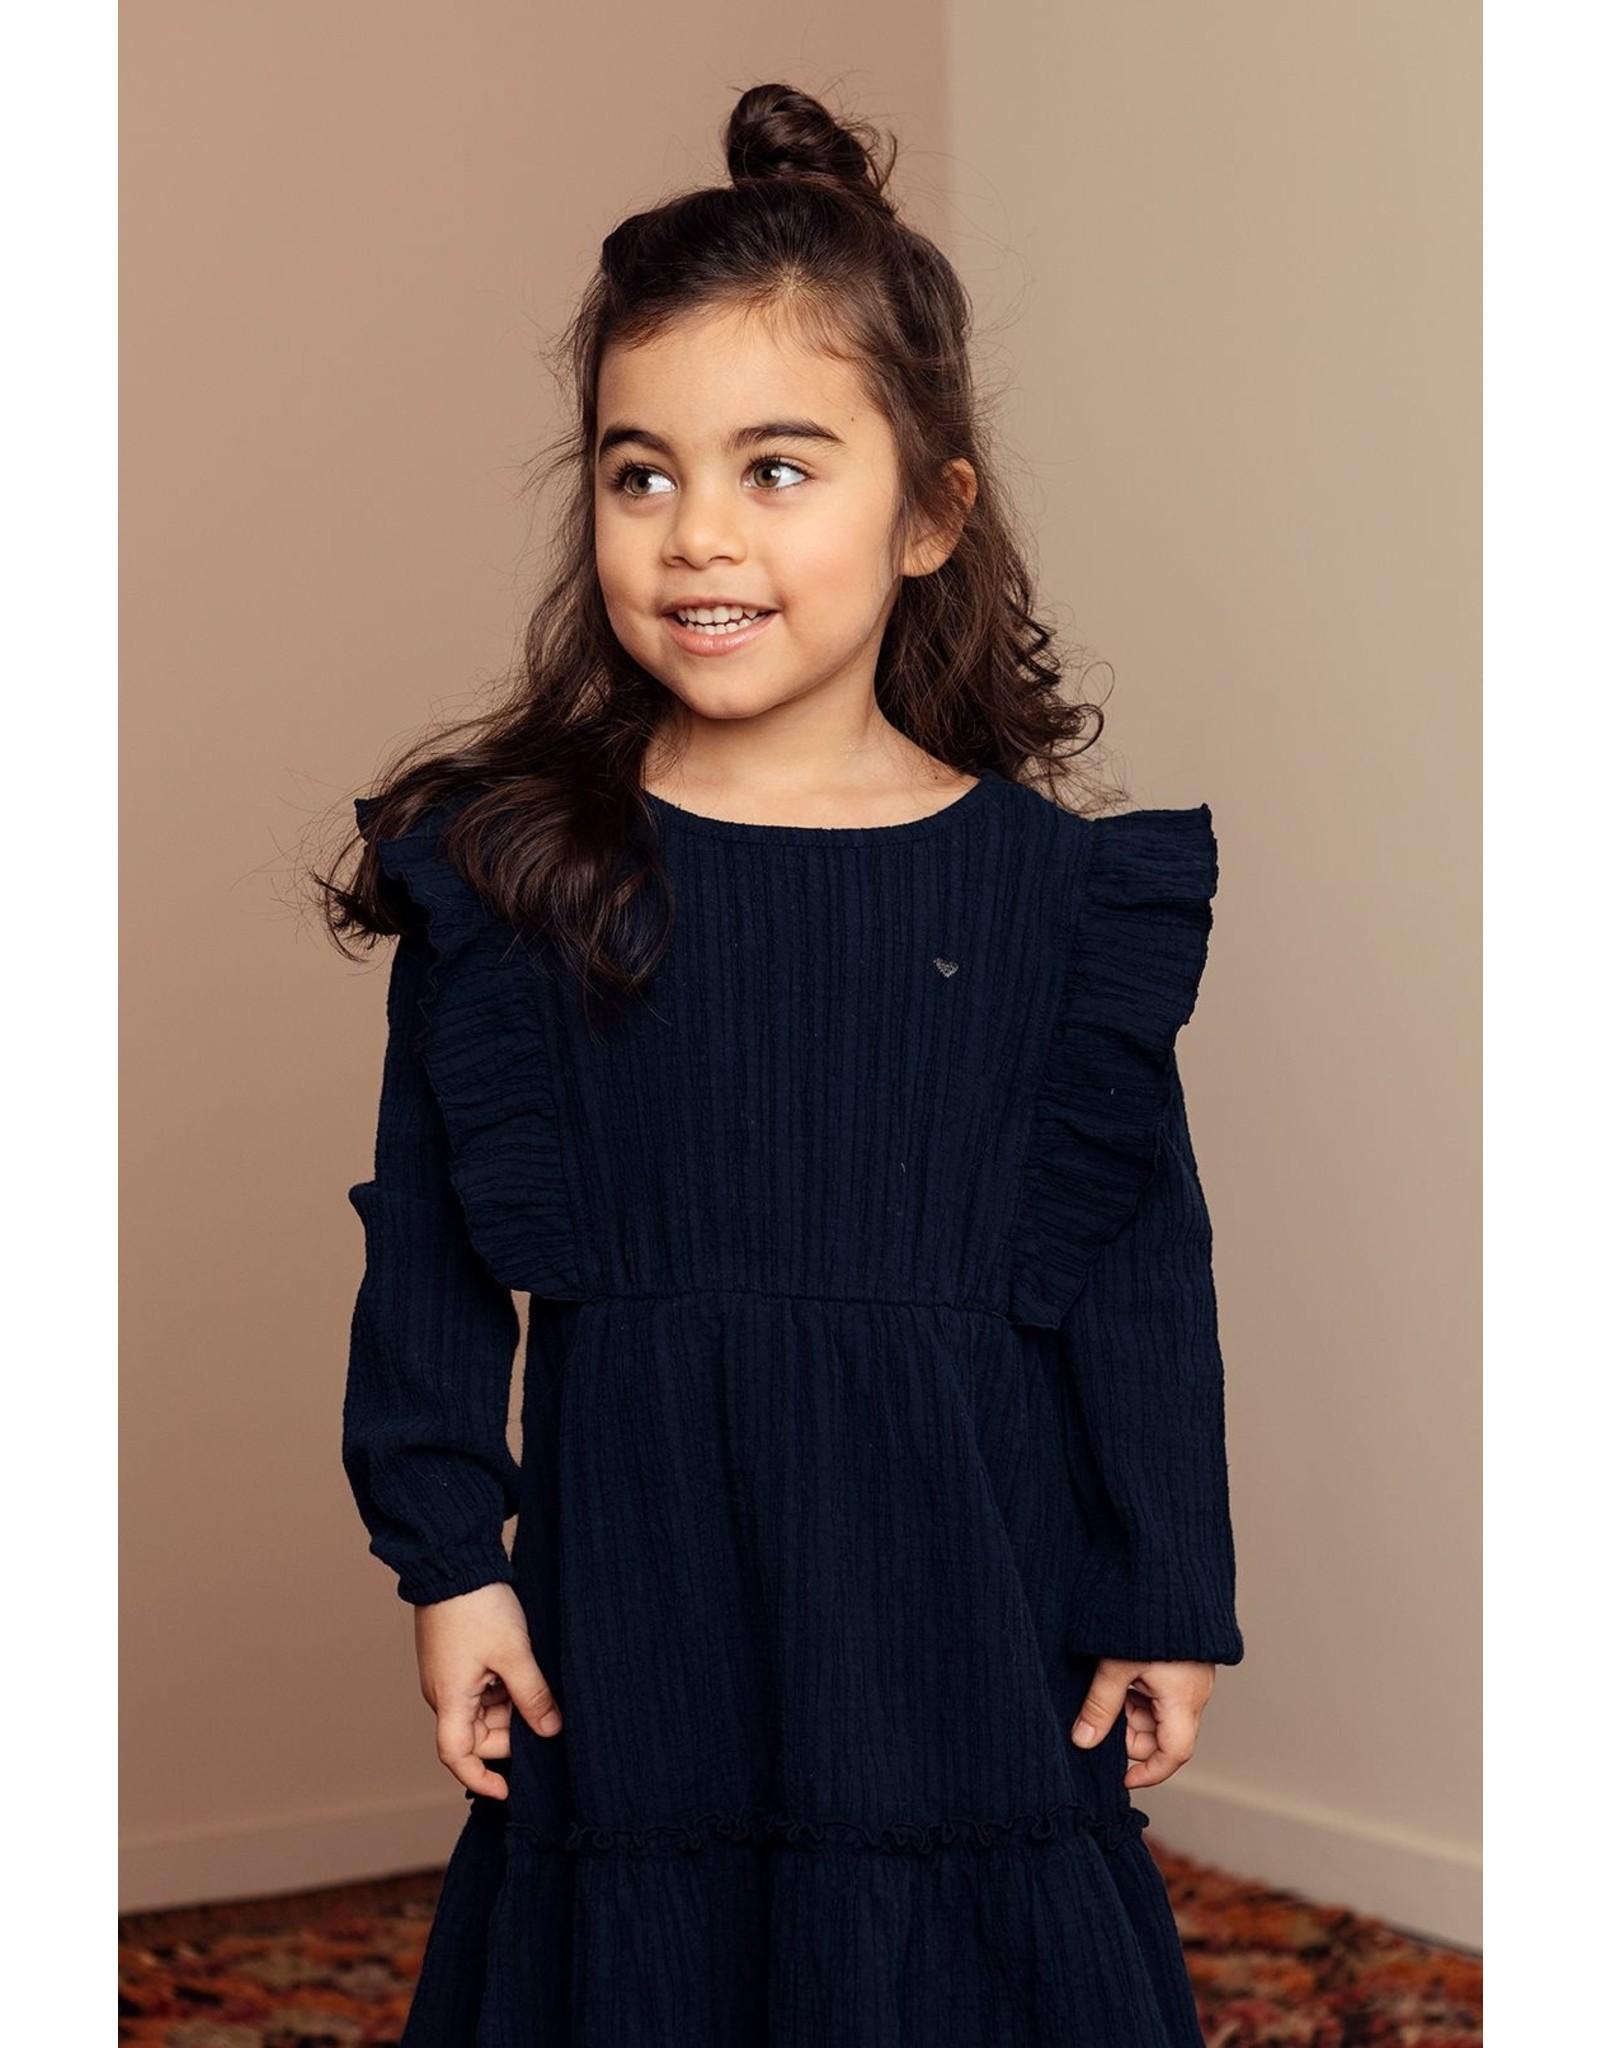 Looxs Little Little dress n